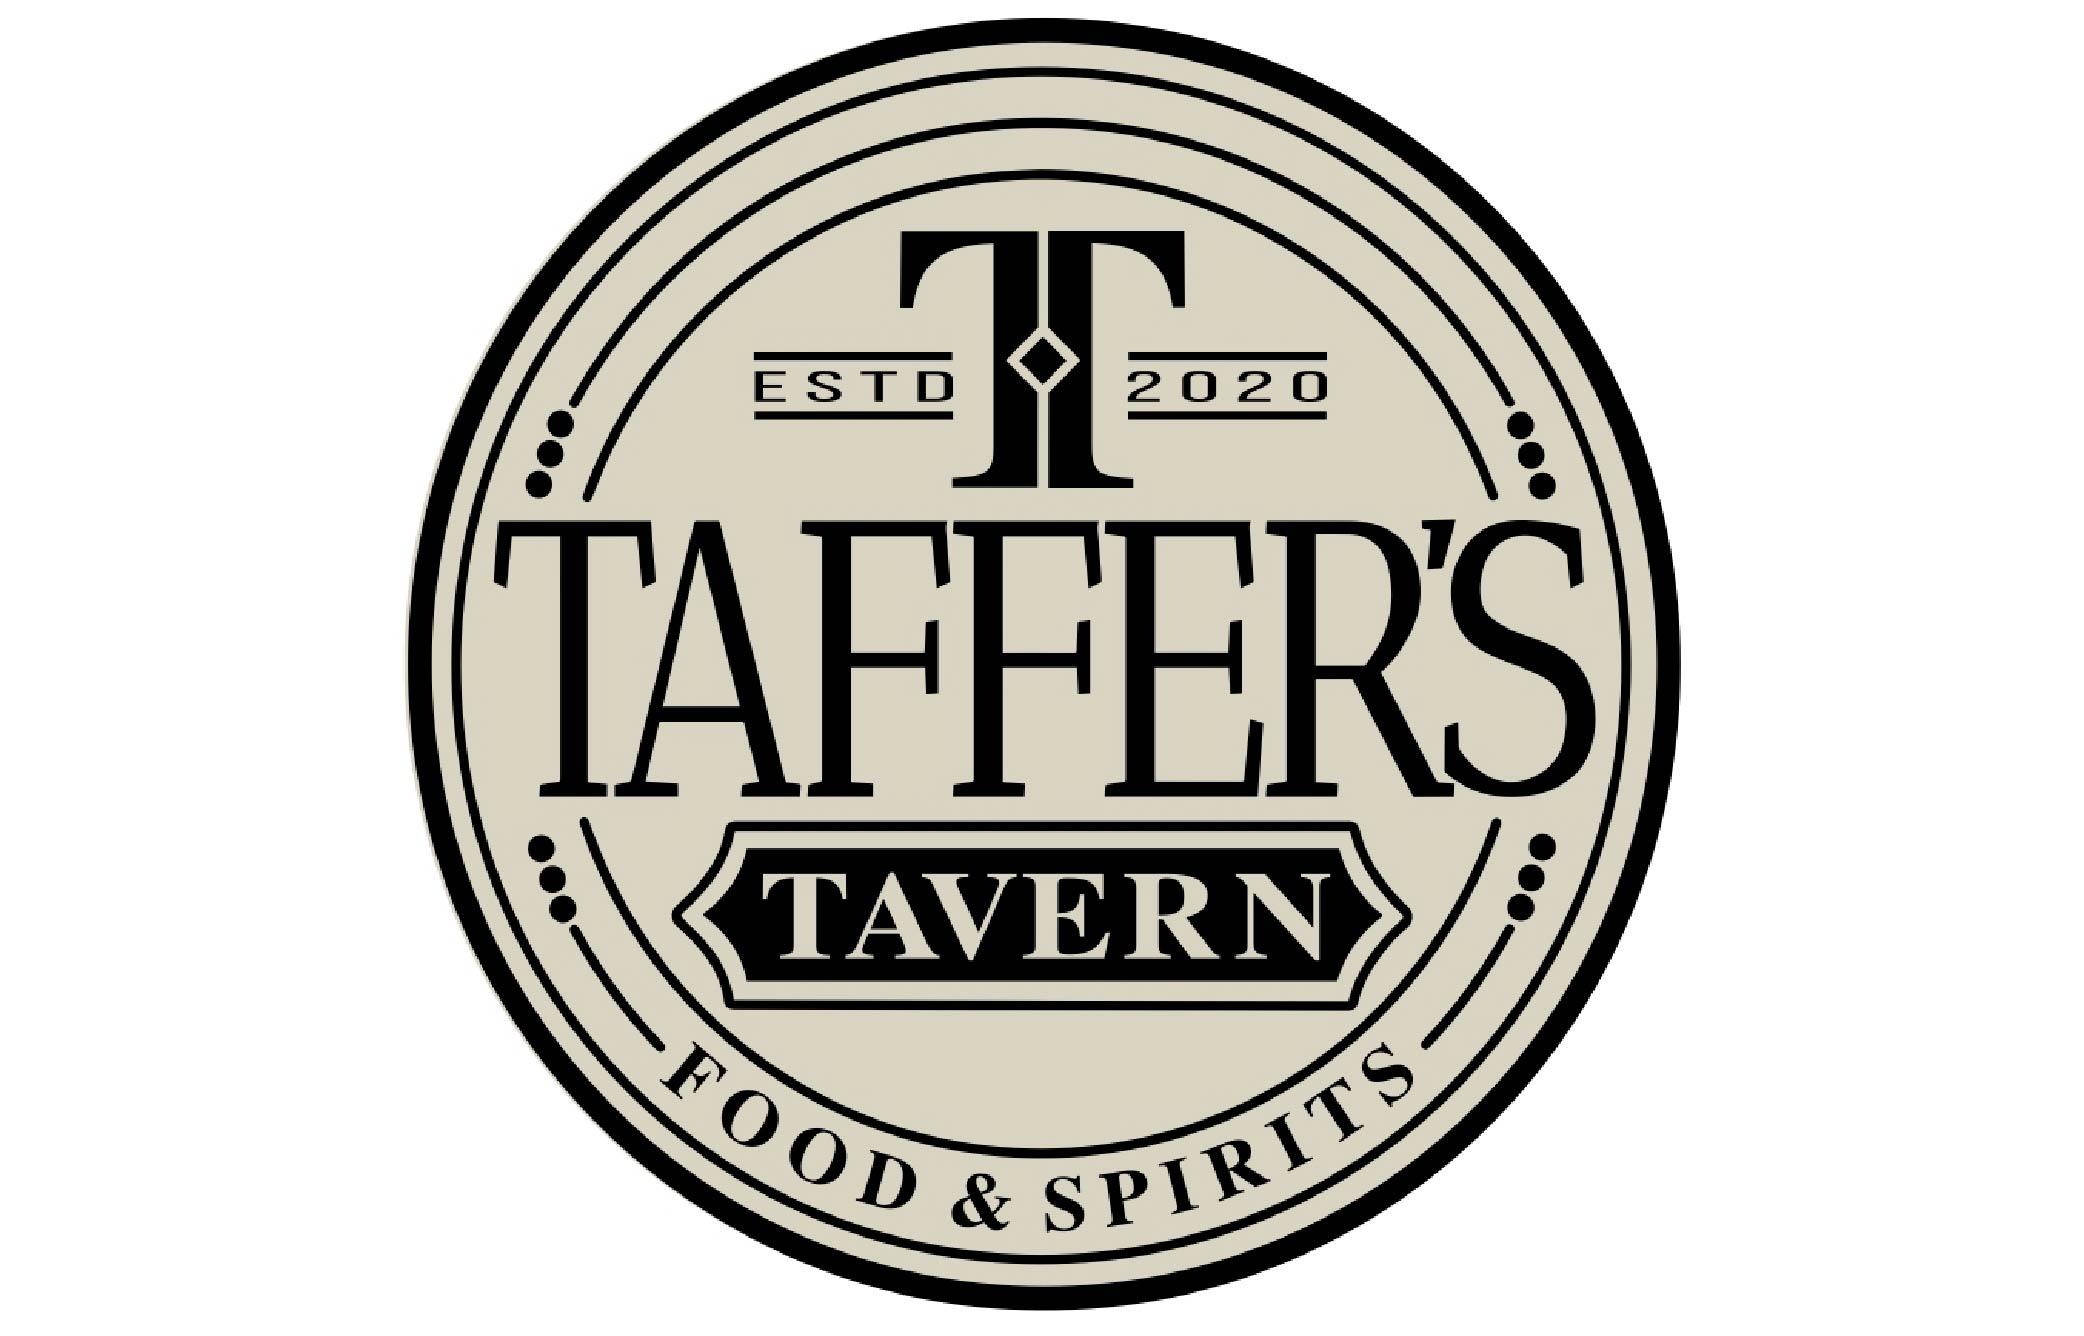 Taffers Tavern Food & Spirits Franchise